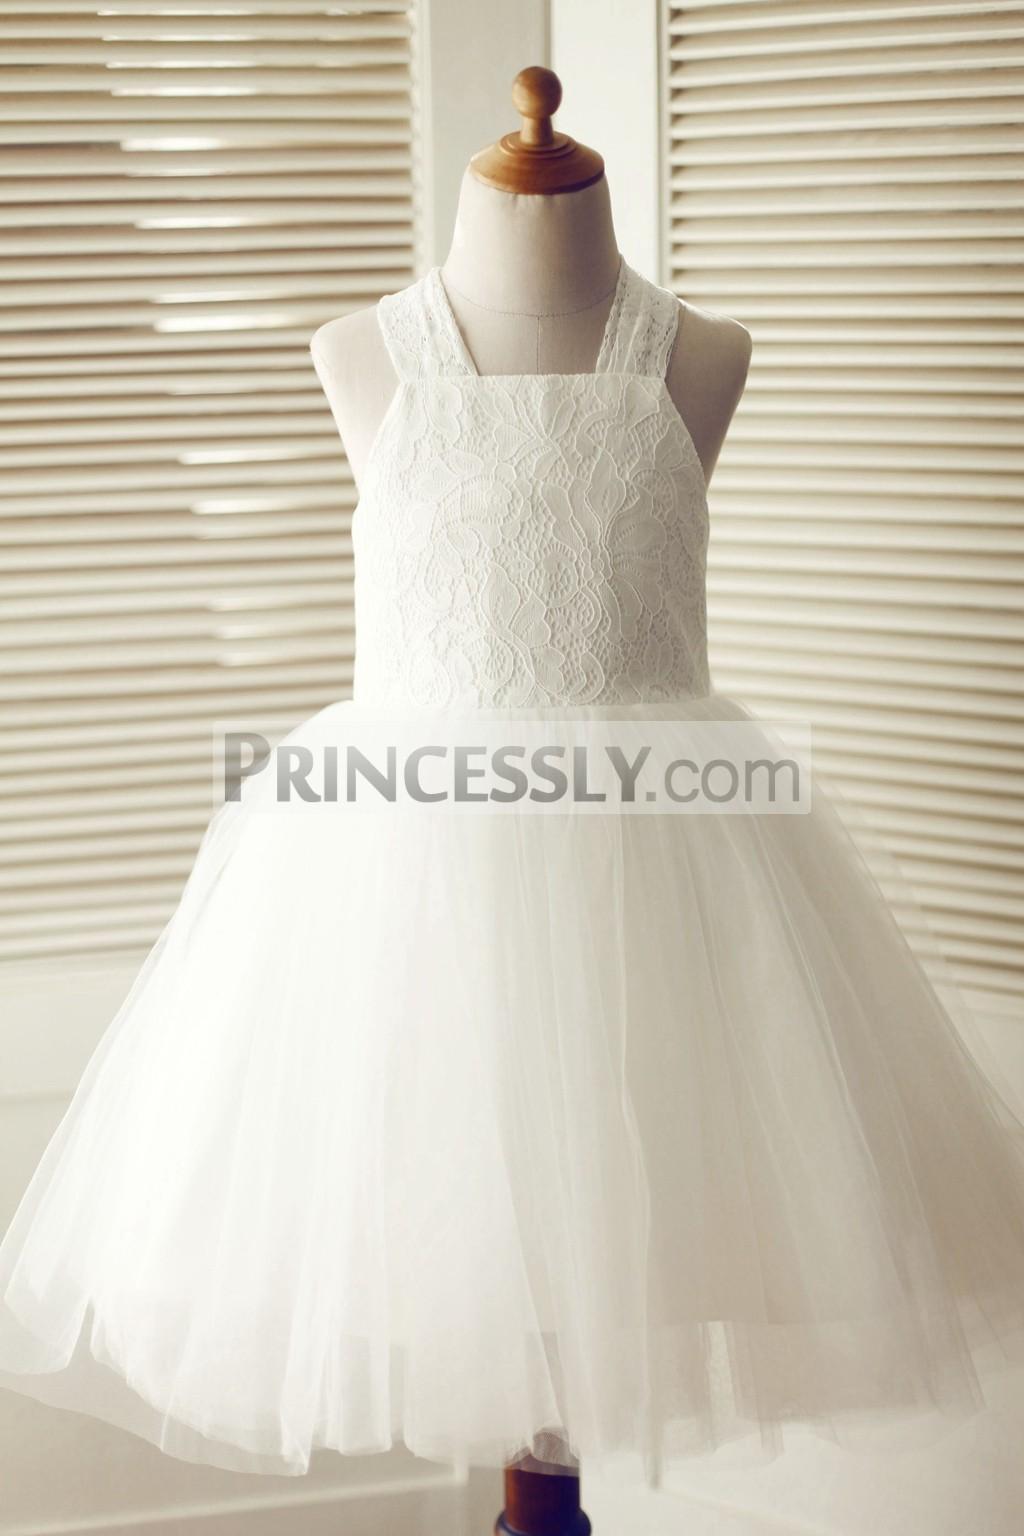 Cross Backless Ivory Lace Tulle Wedding Flower Girl Dress